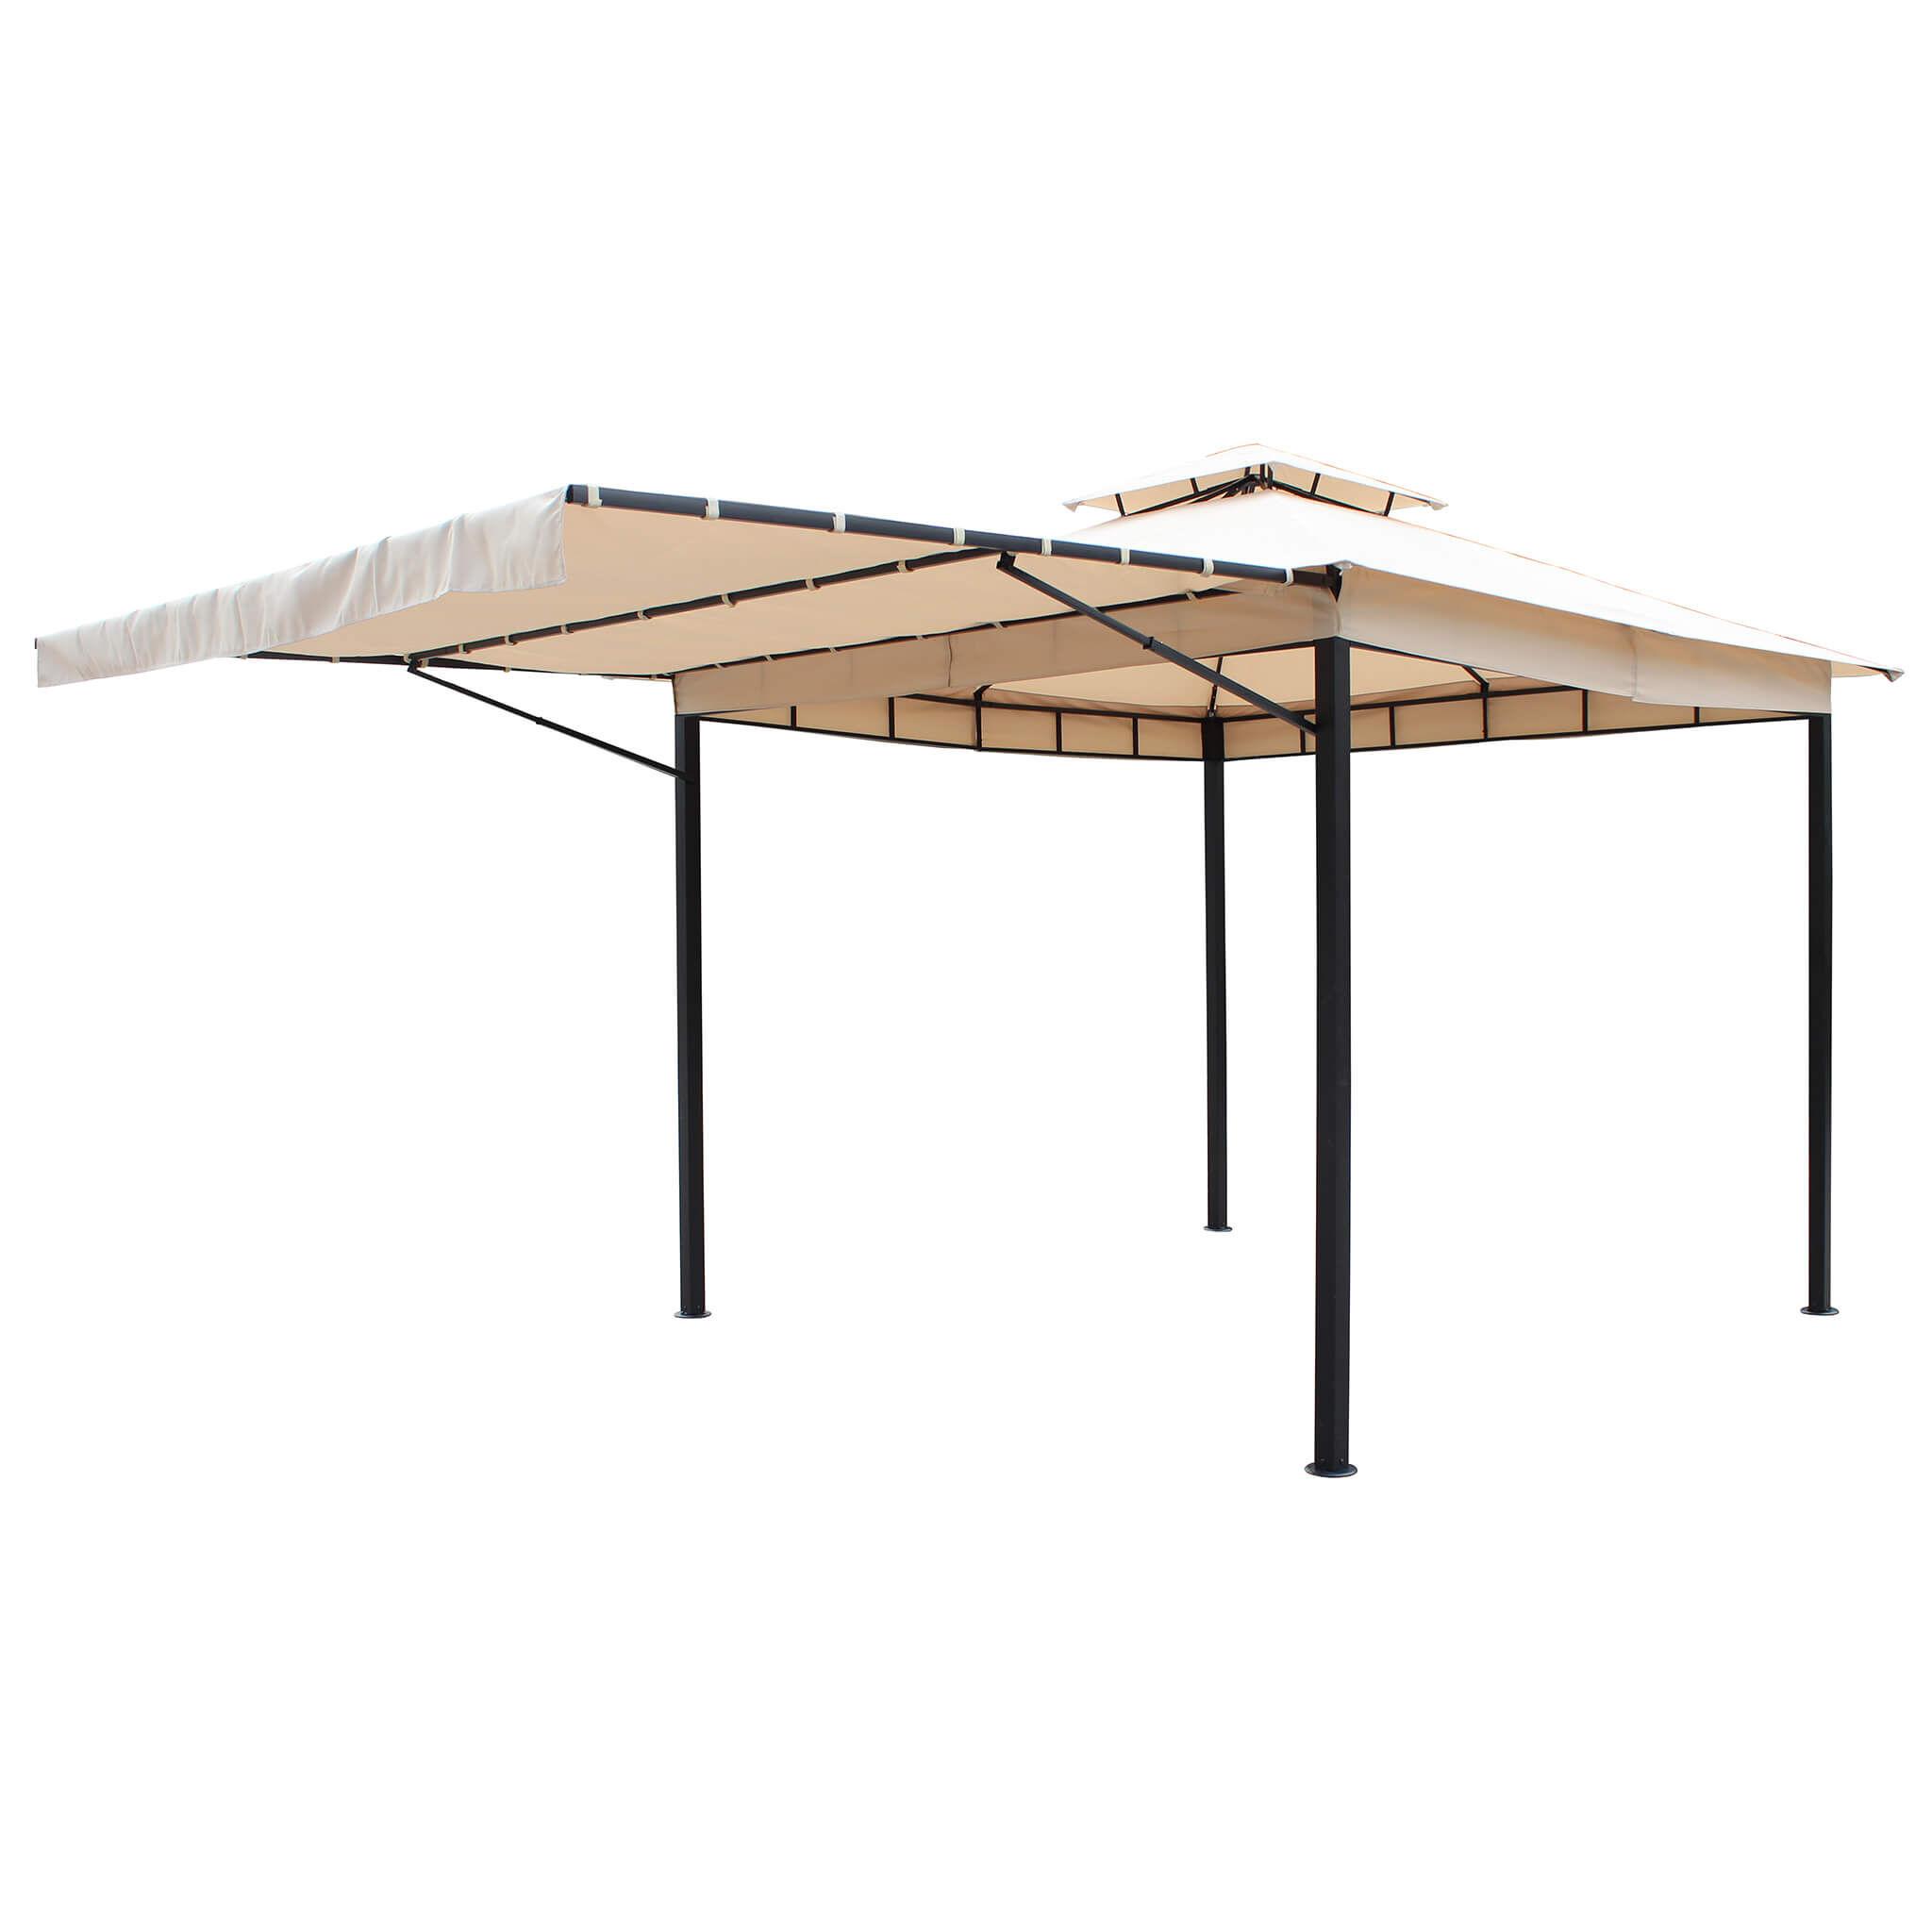 milani home alexander - gazebo da giardino 3,3x3,3 di tettoia apribile